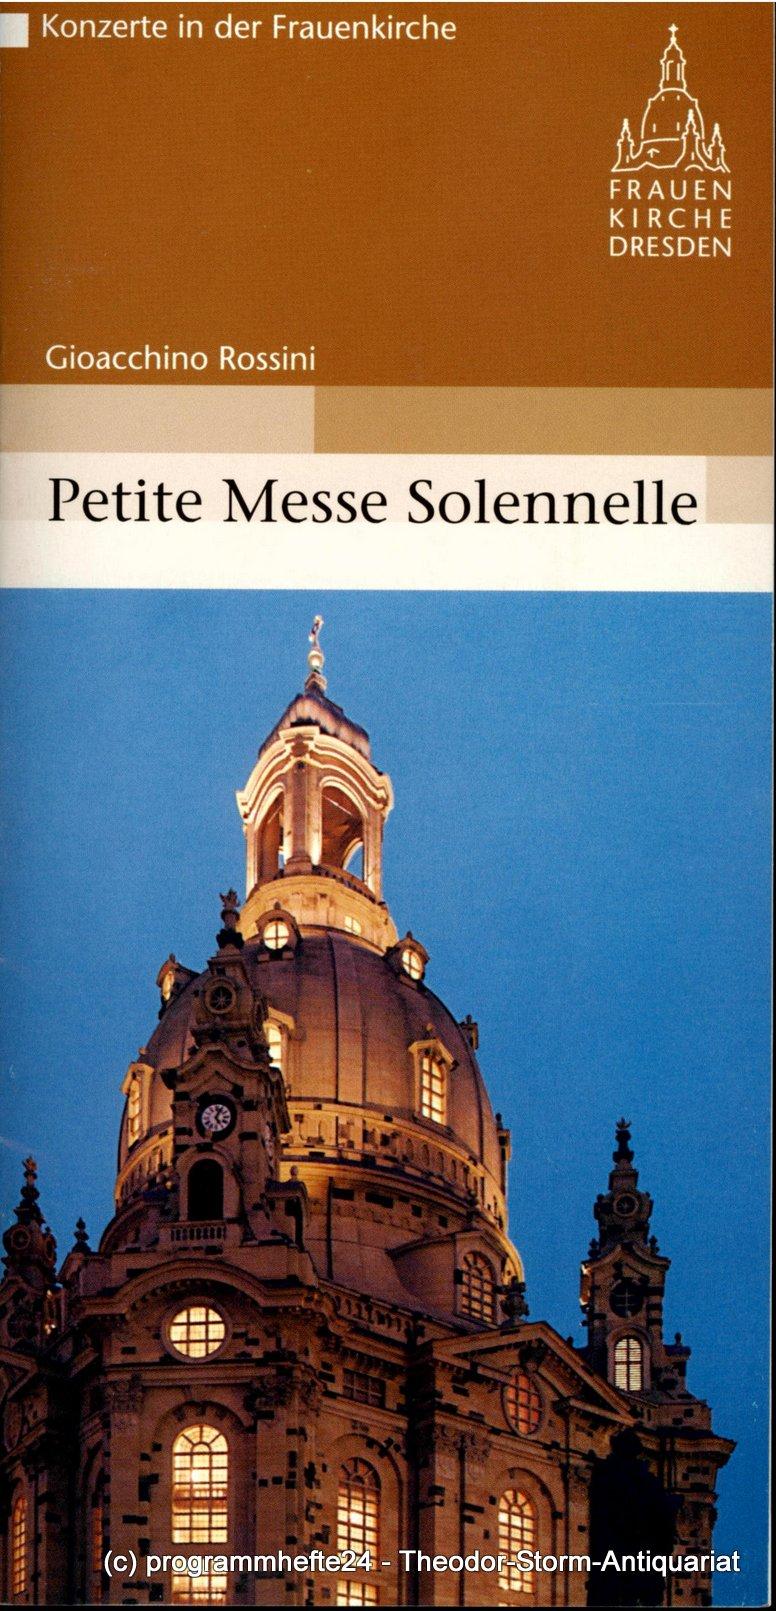 Programmheft  Petite Messe Solennelle. Dresdner Frauenkirche 2005